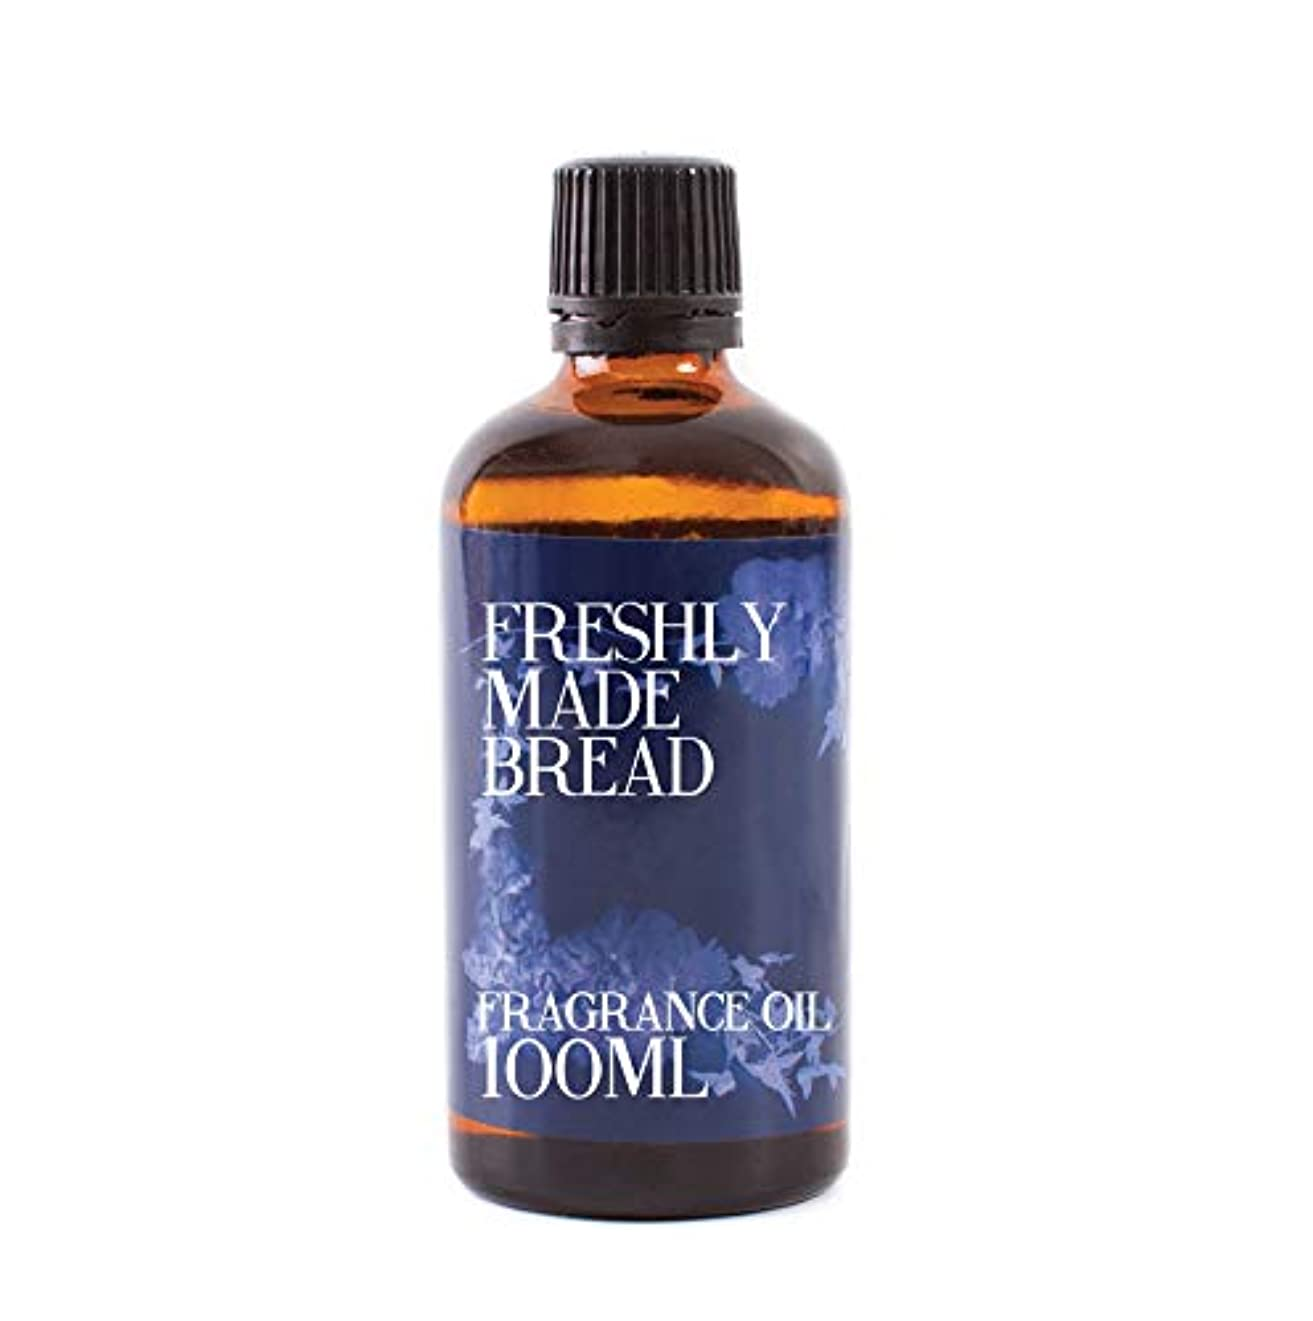 Mystic Moments | Freshly Made Bread Fragrance Oil - 100ml